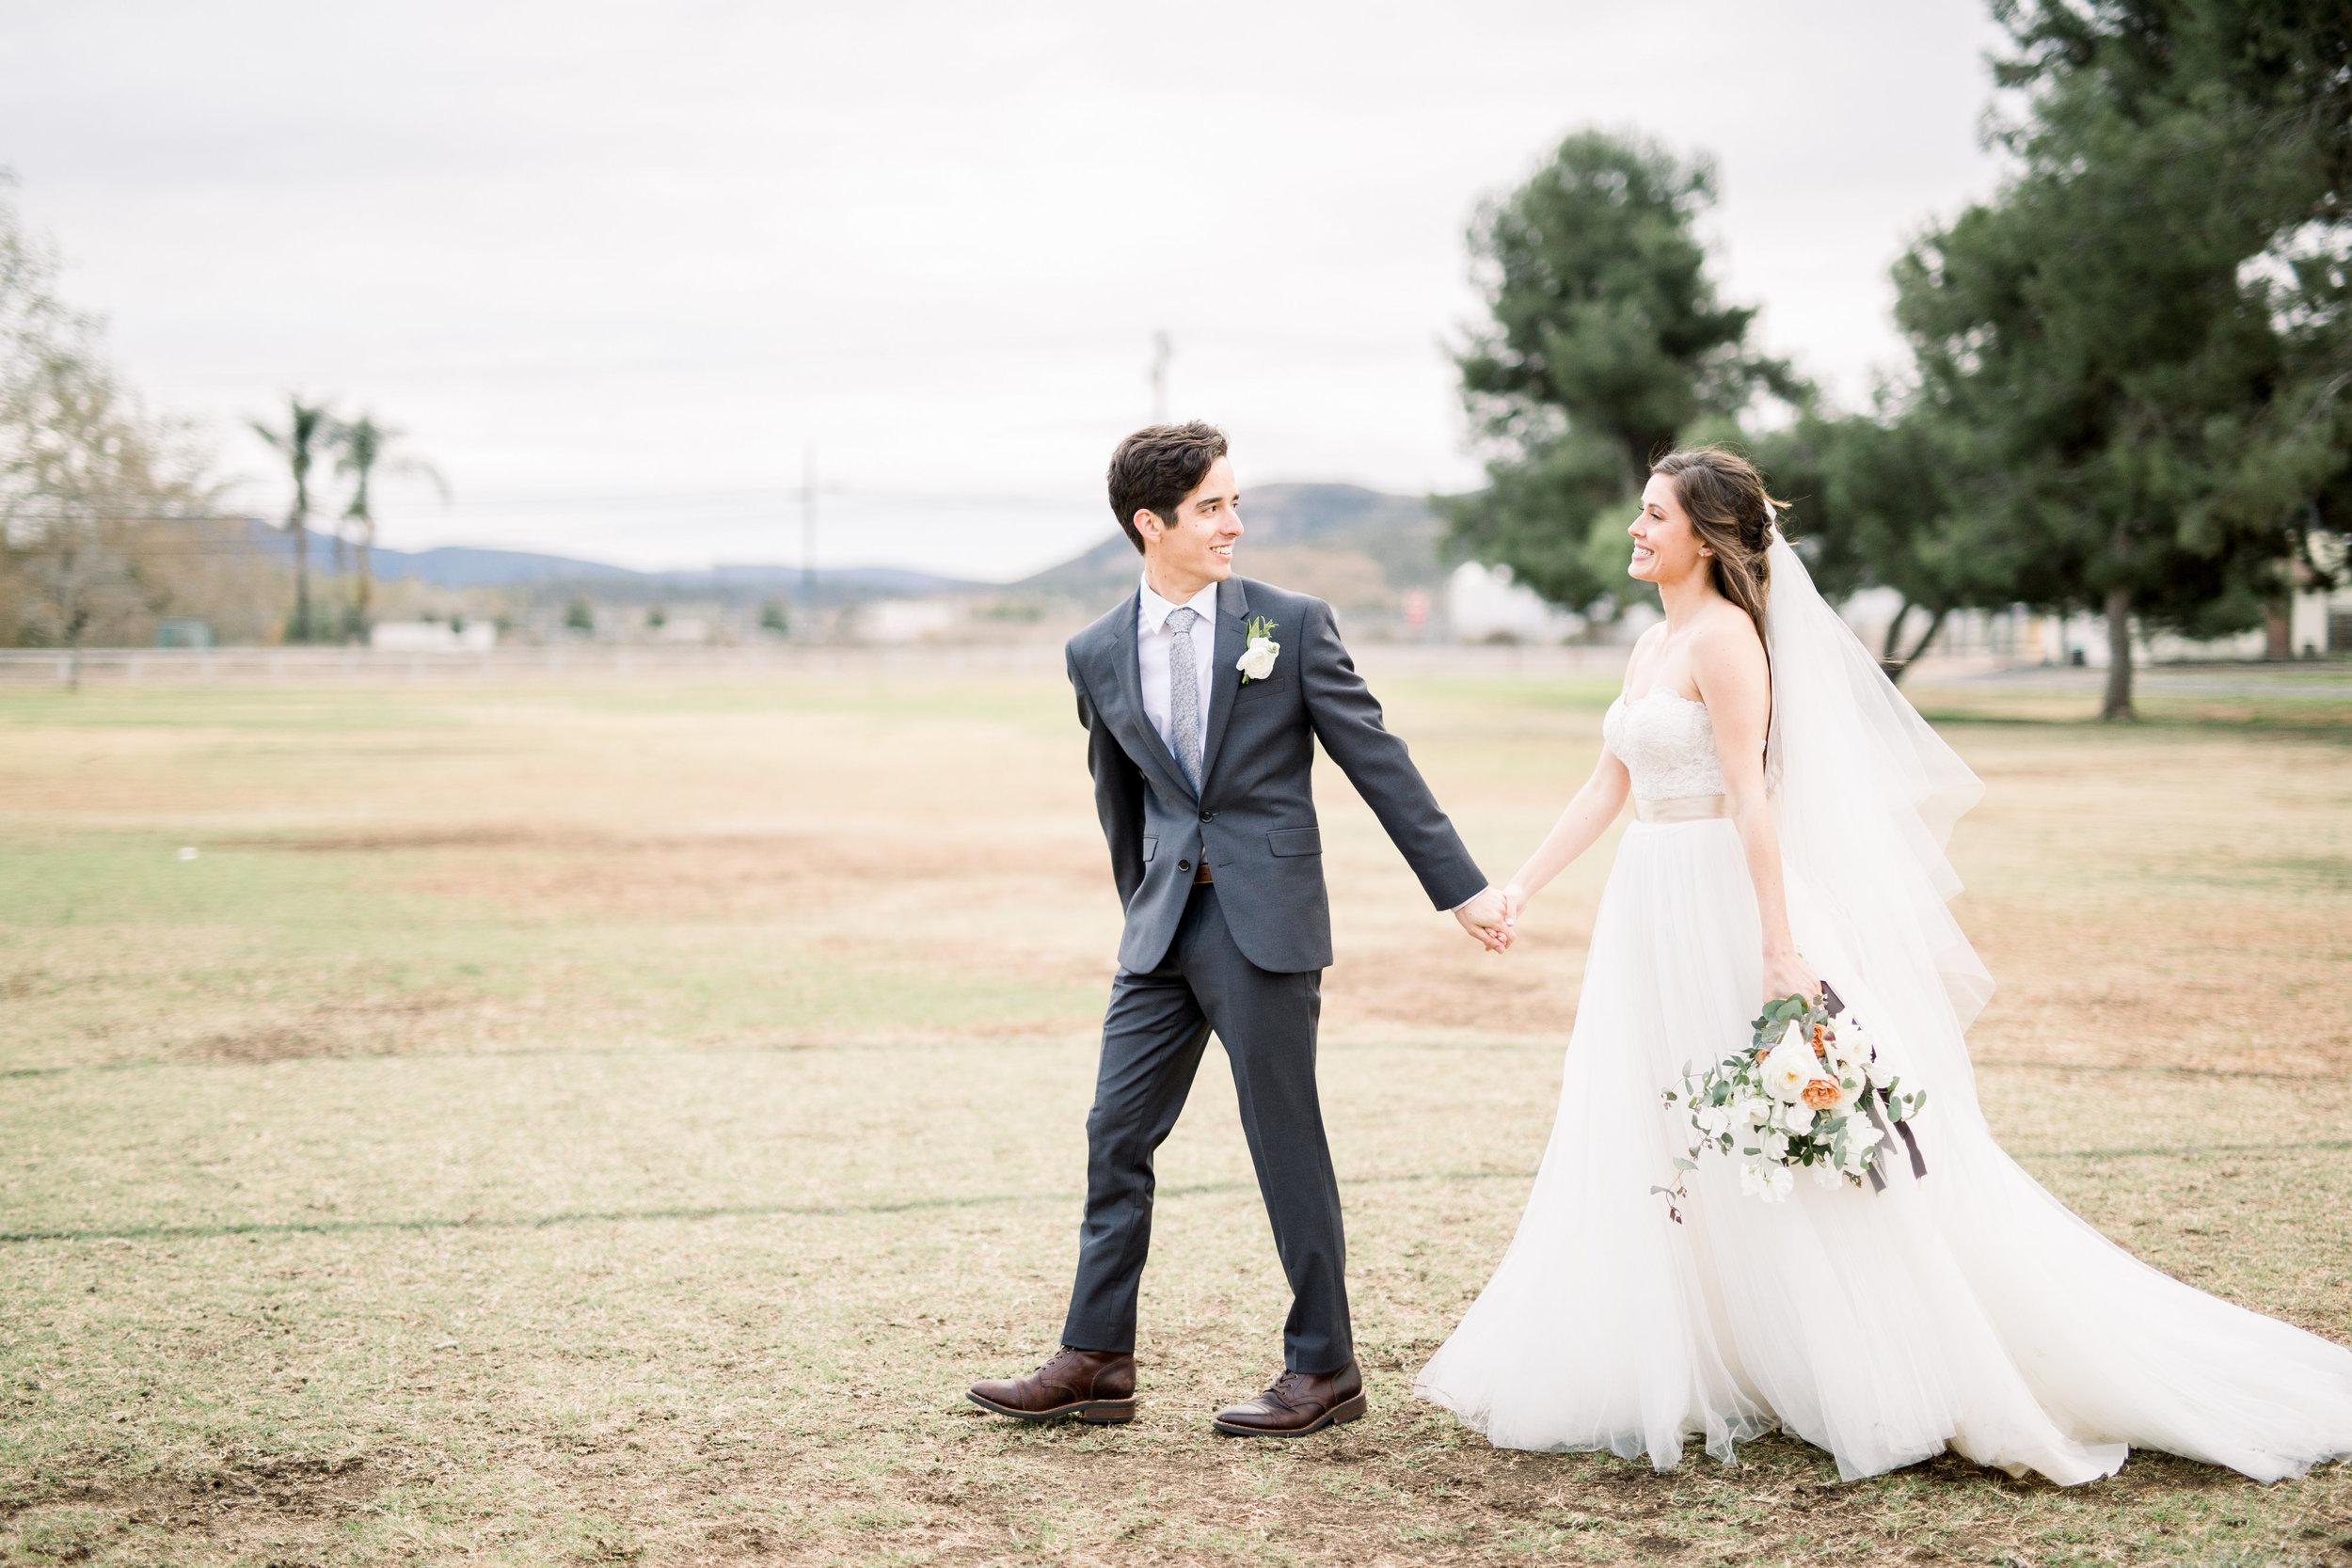 Ivy Jacob Wedding-Romantics-0023.jpg